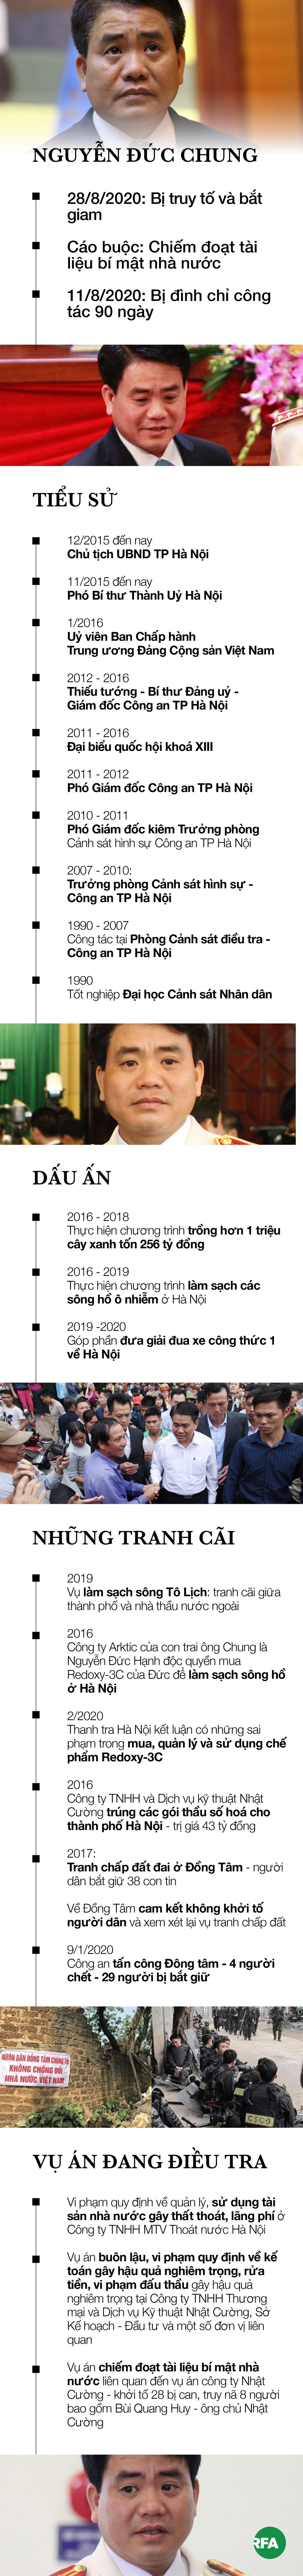 info_chung